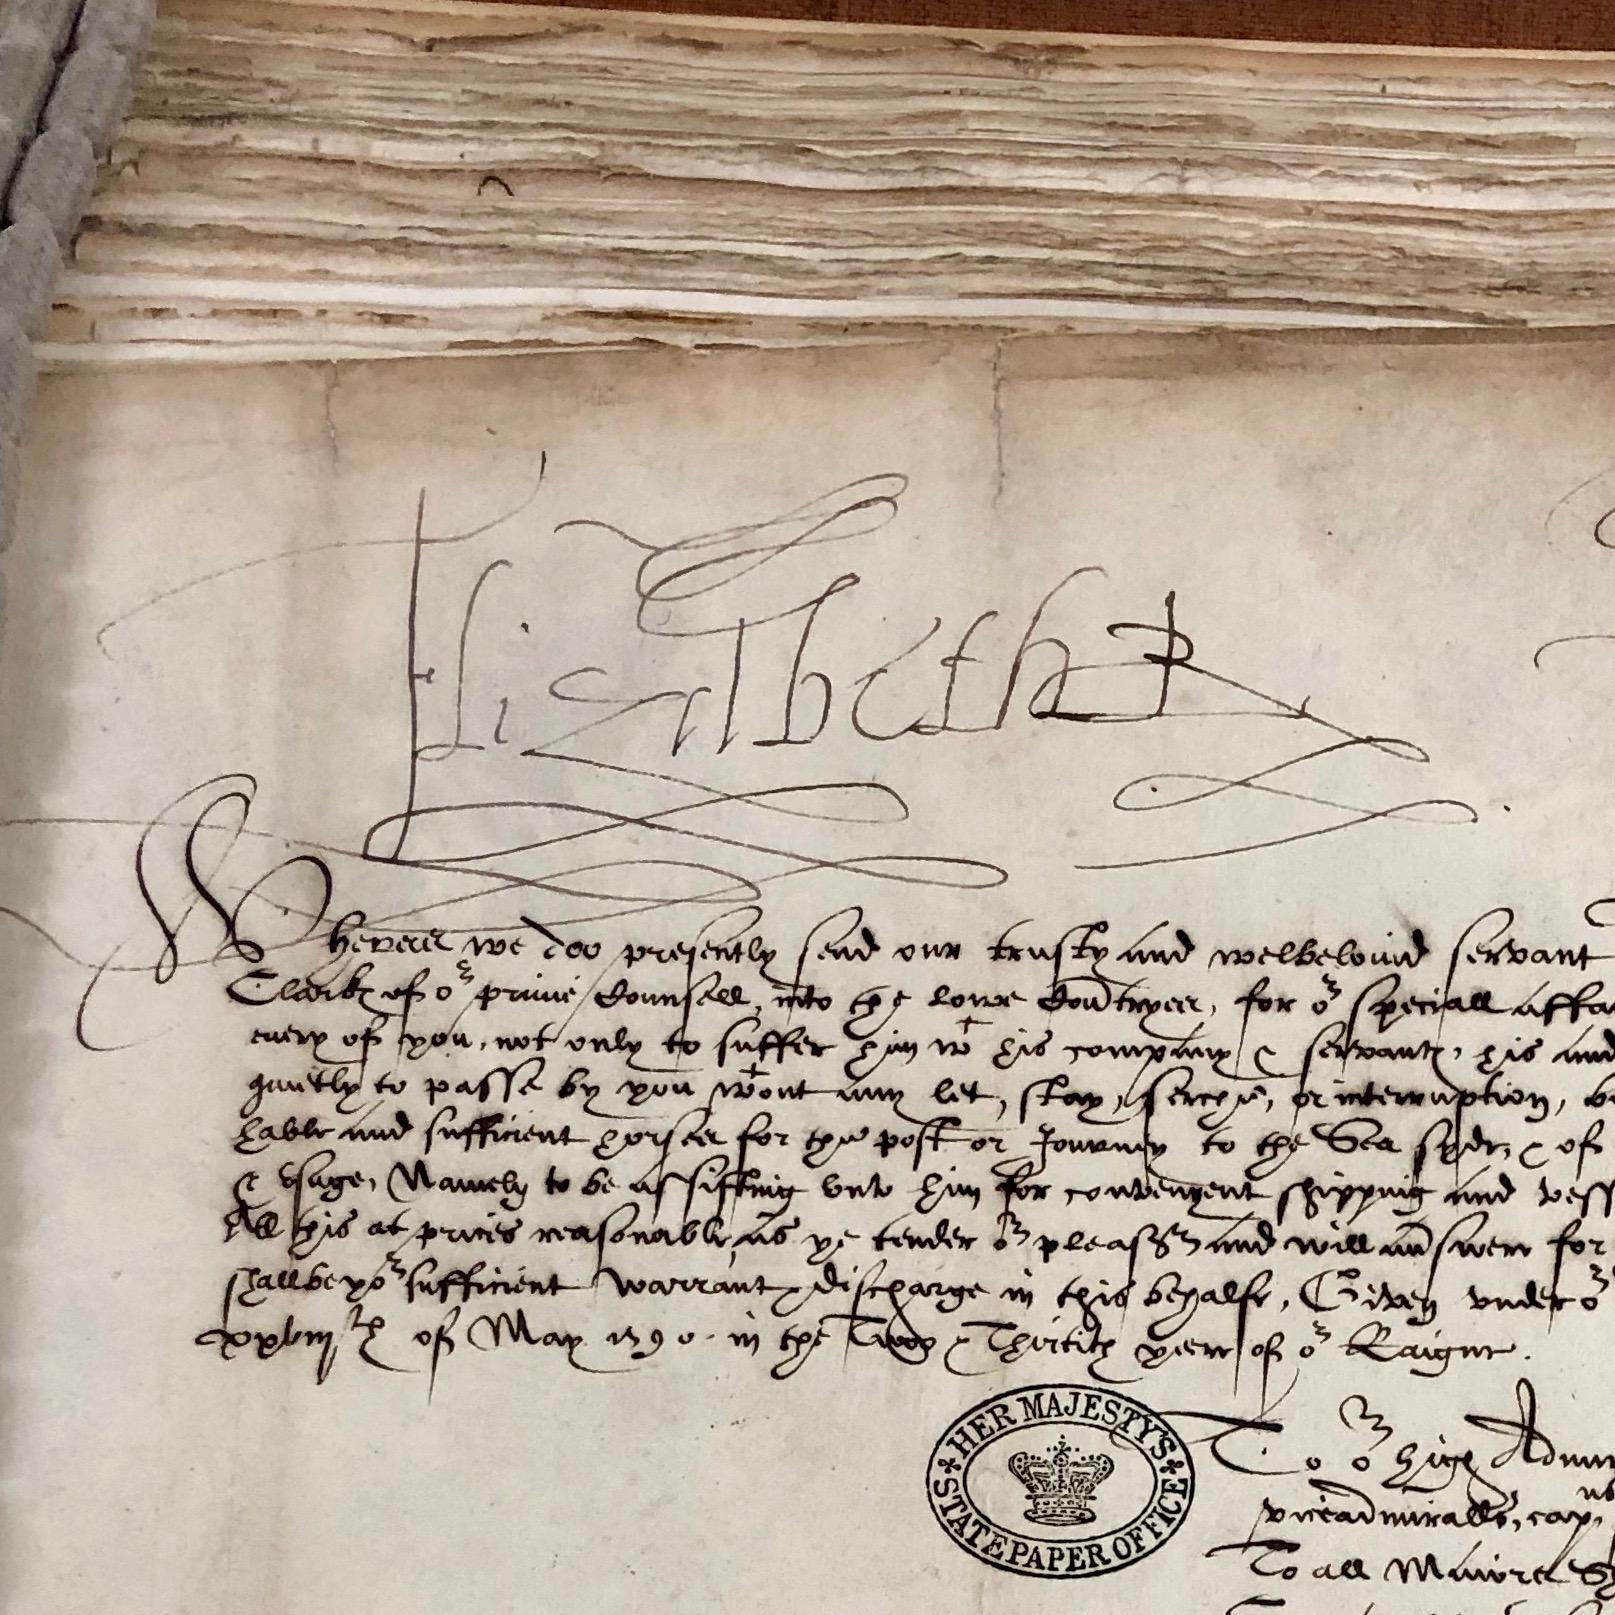 Queenie's signature was very Queenie.